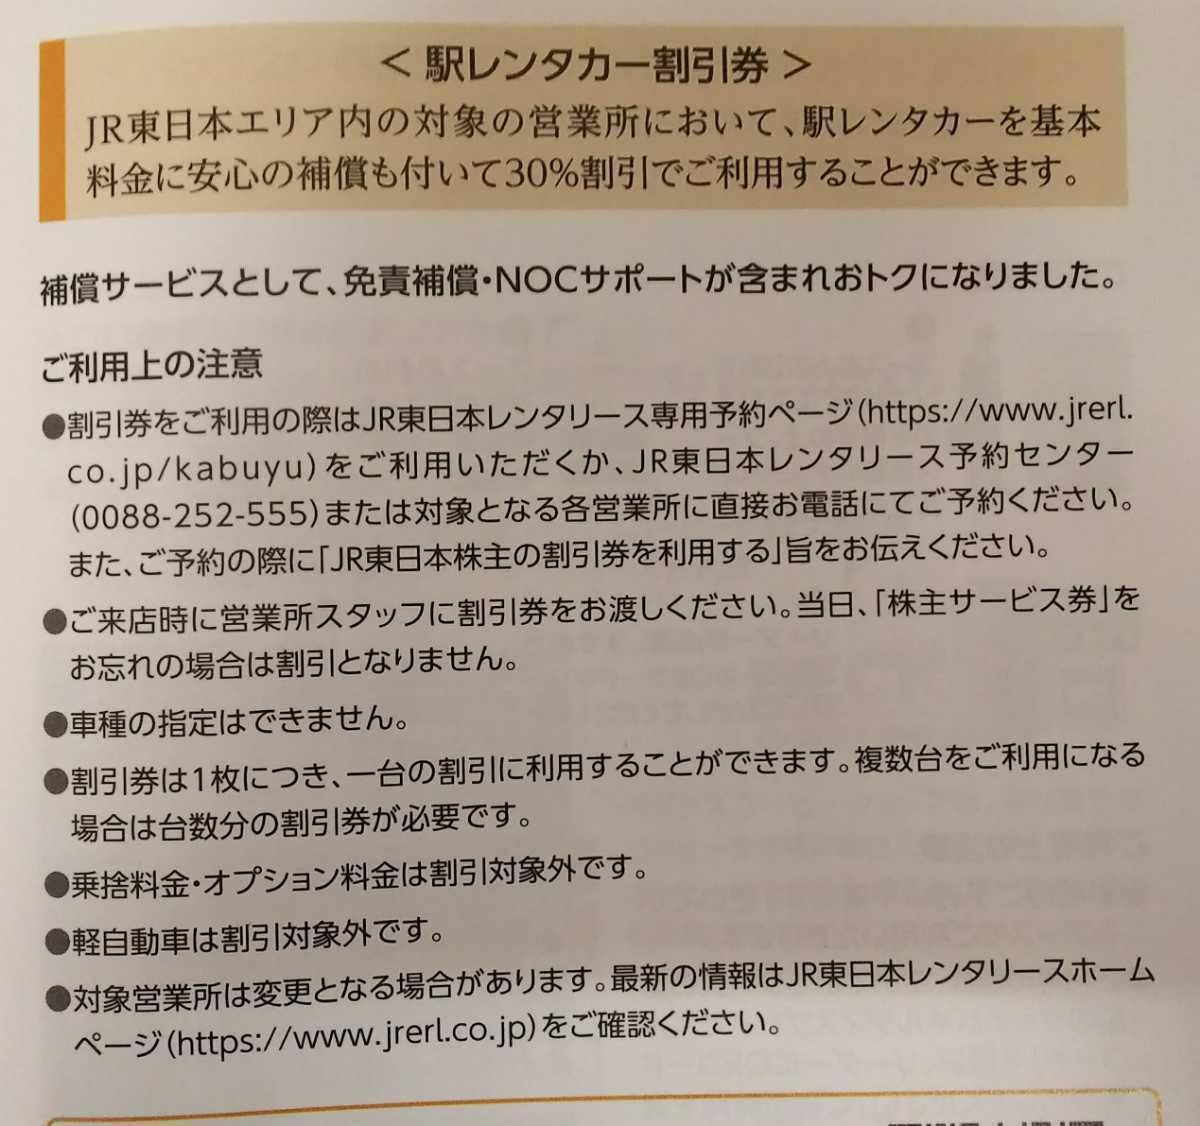 JR東日本 株主サービス券 駅レンタカー割引券 1枚 30%割引 有効期限2022年5月31日まで ②*_画像3